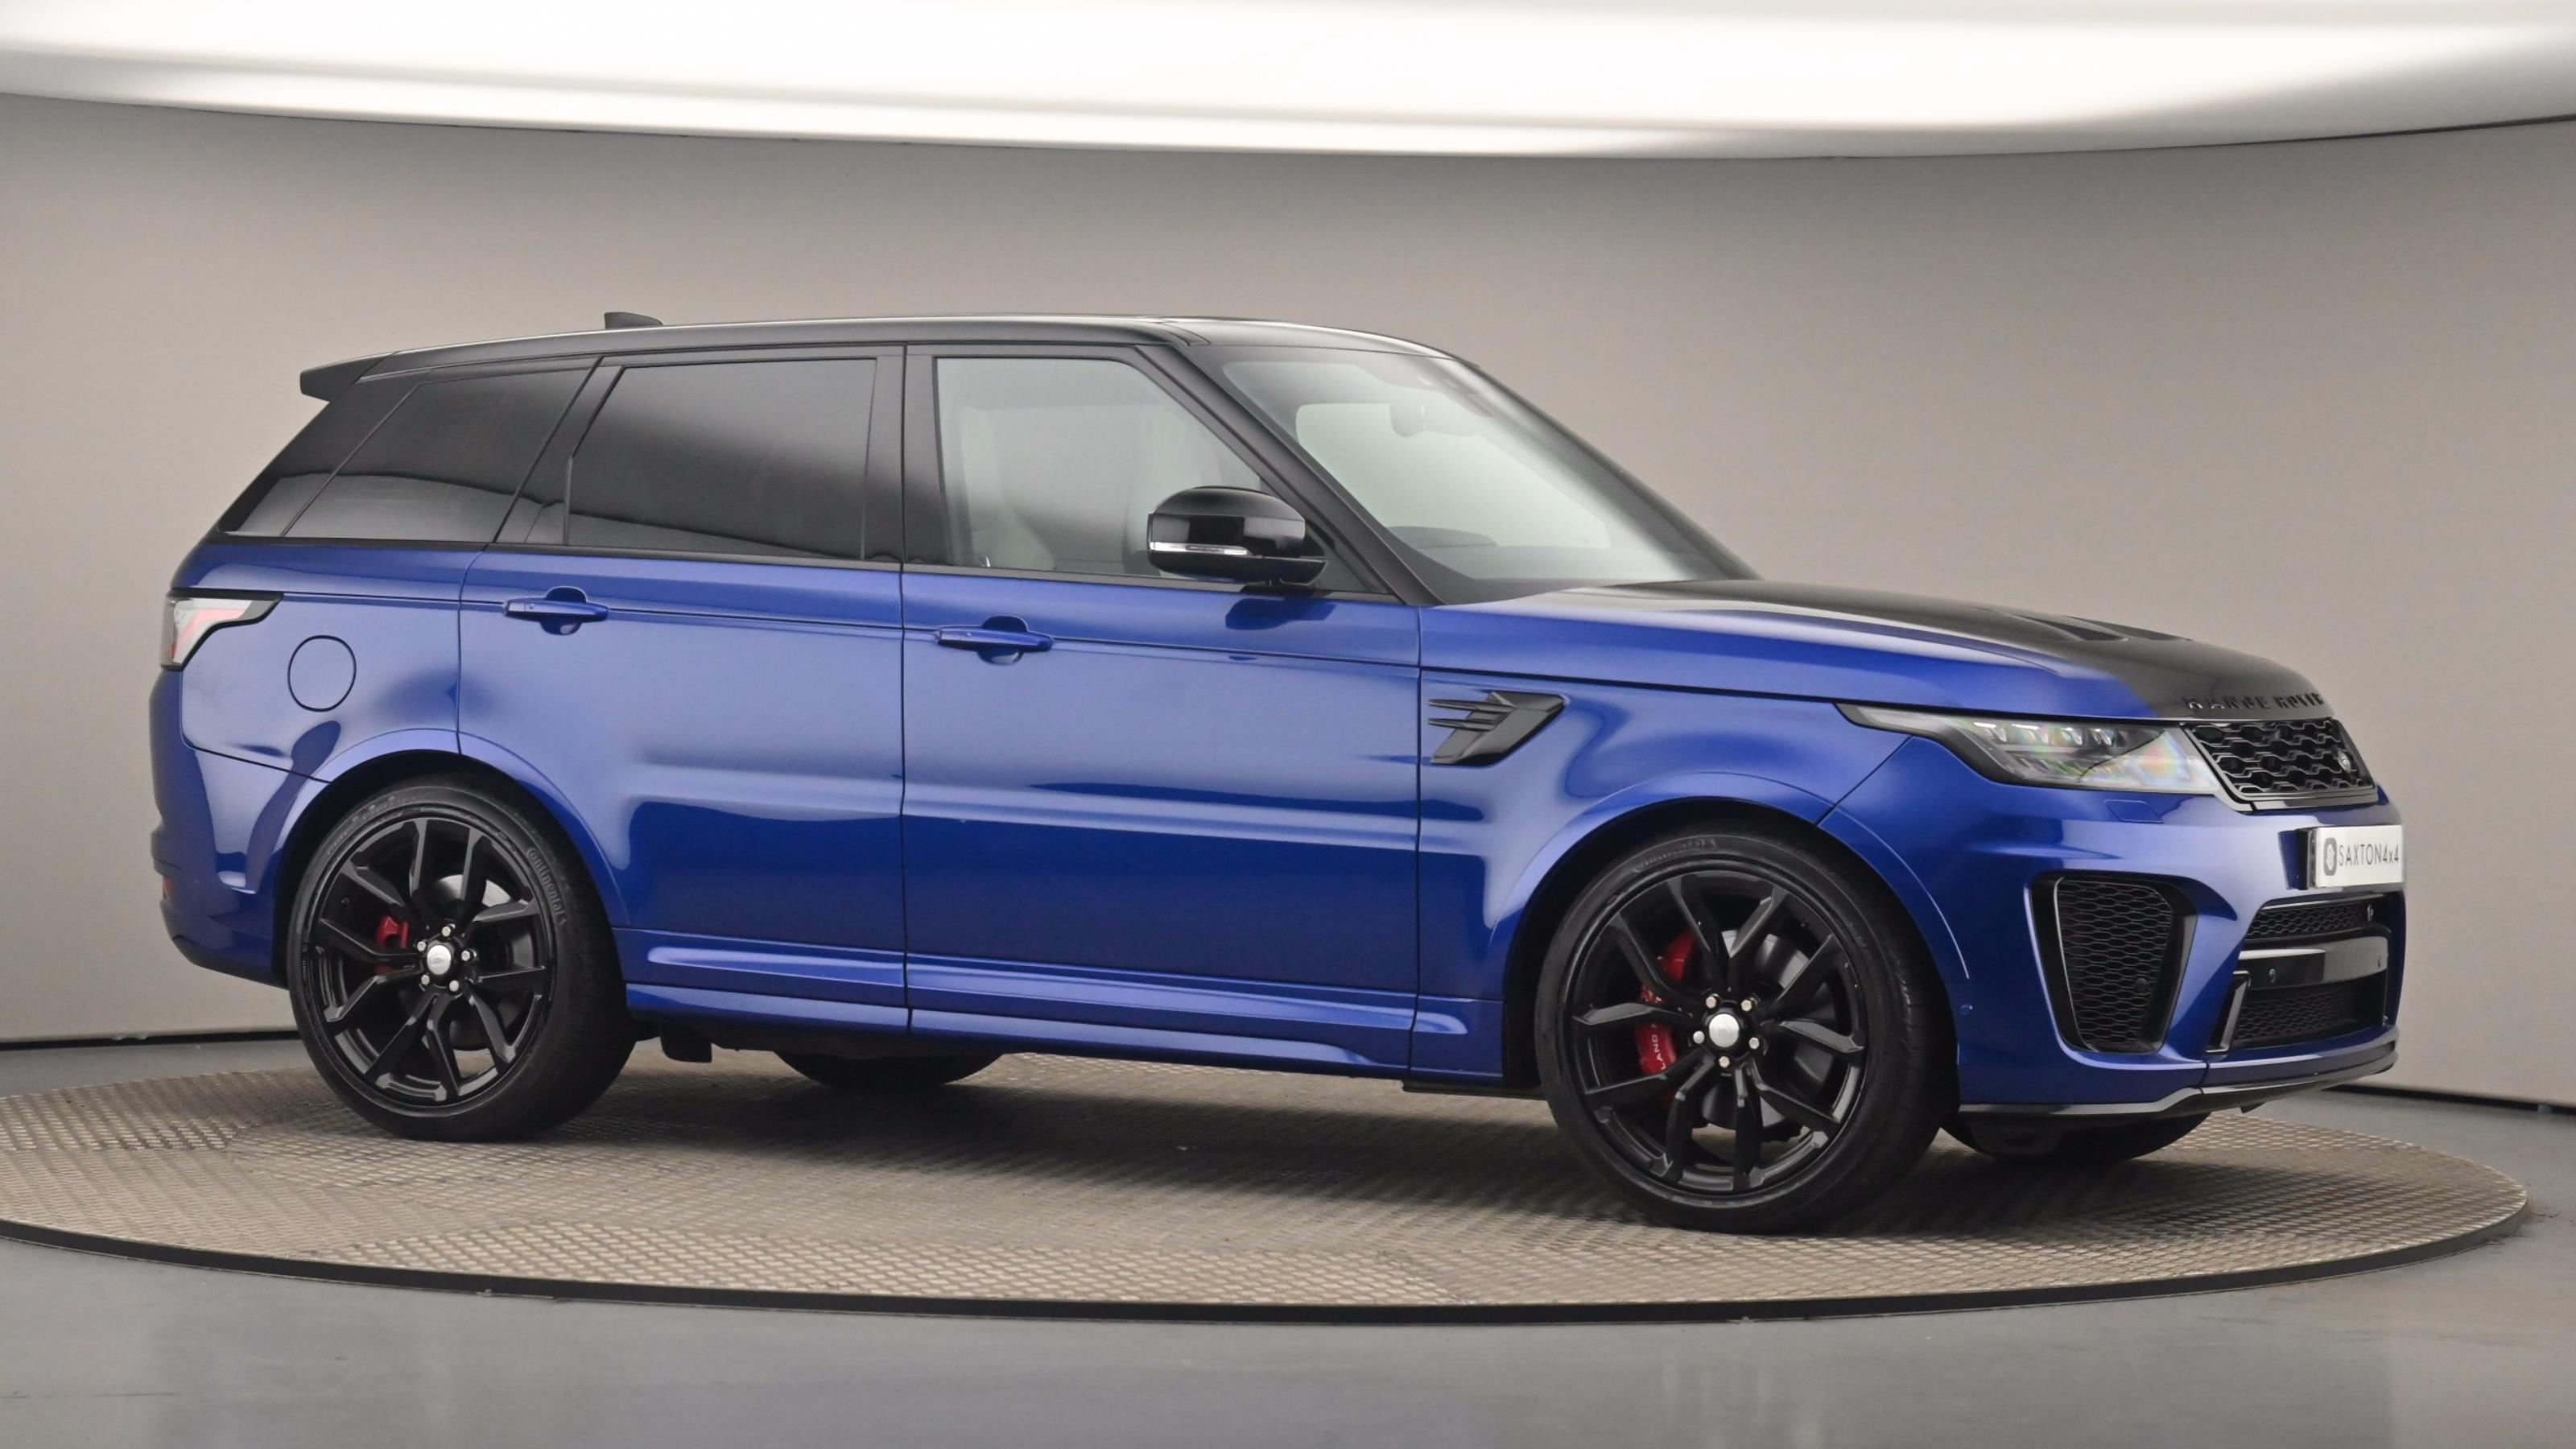 Range Rover Sport >> Land Rover Range Rover Sport